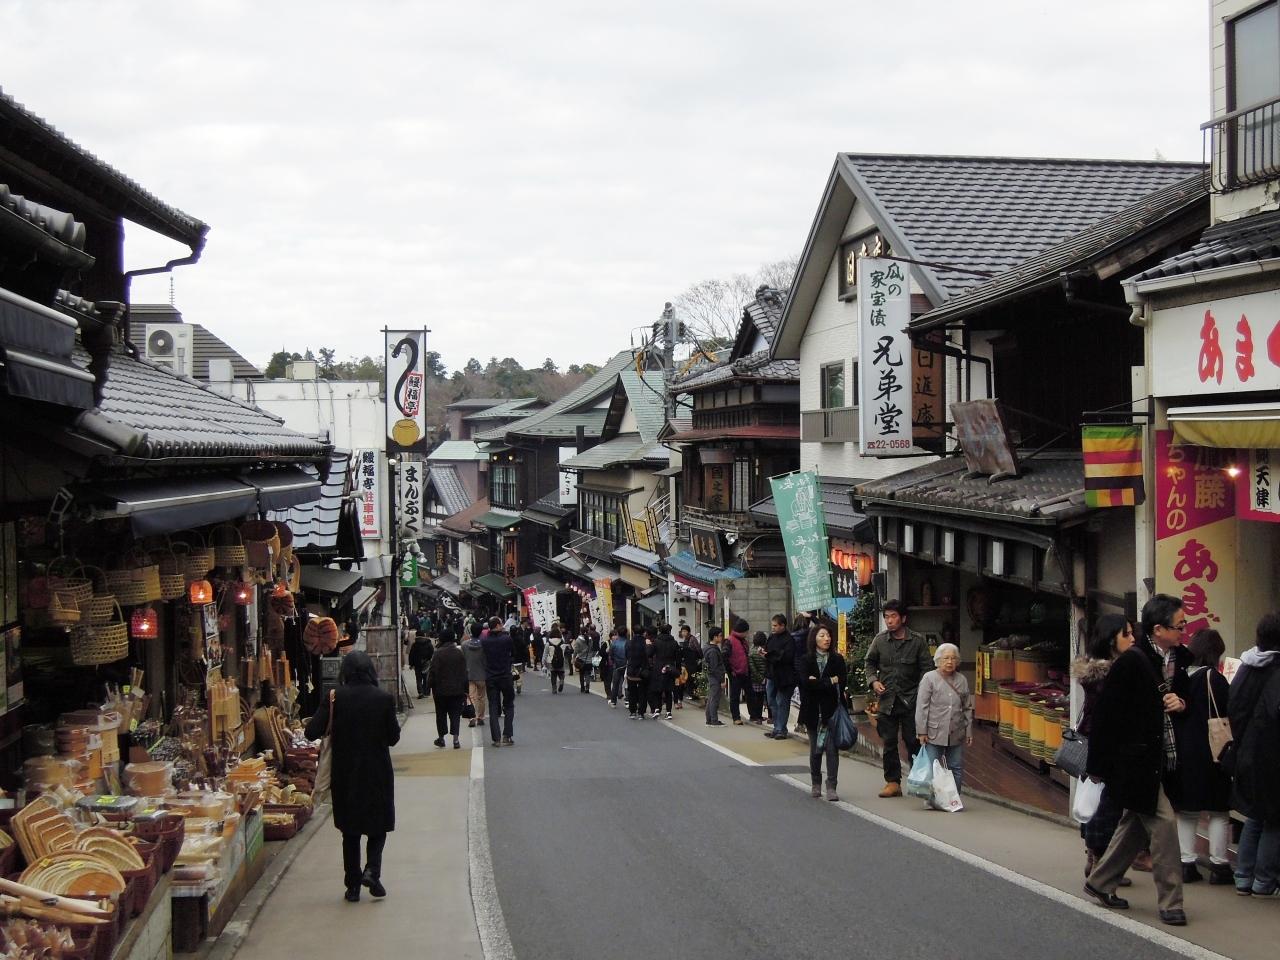 Omotesando (Shopping Street)